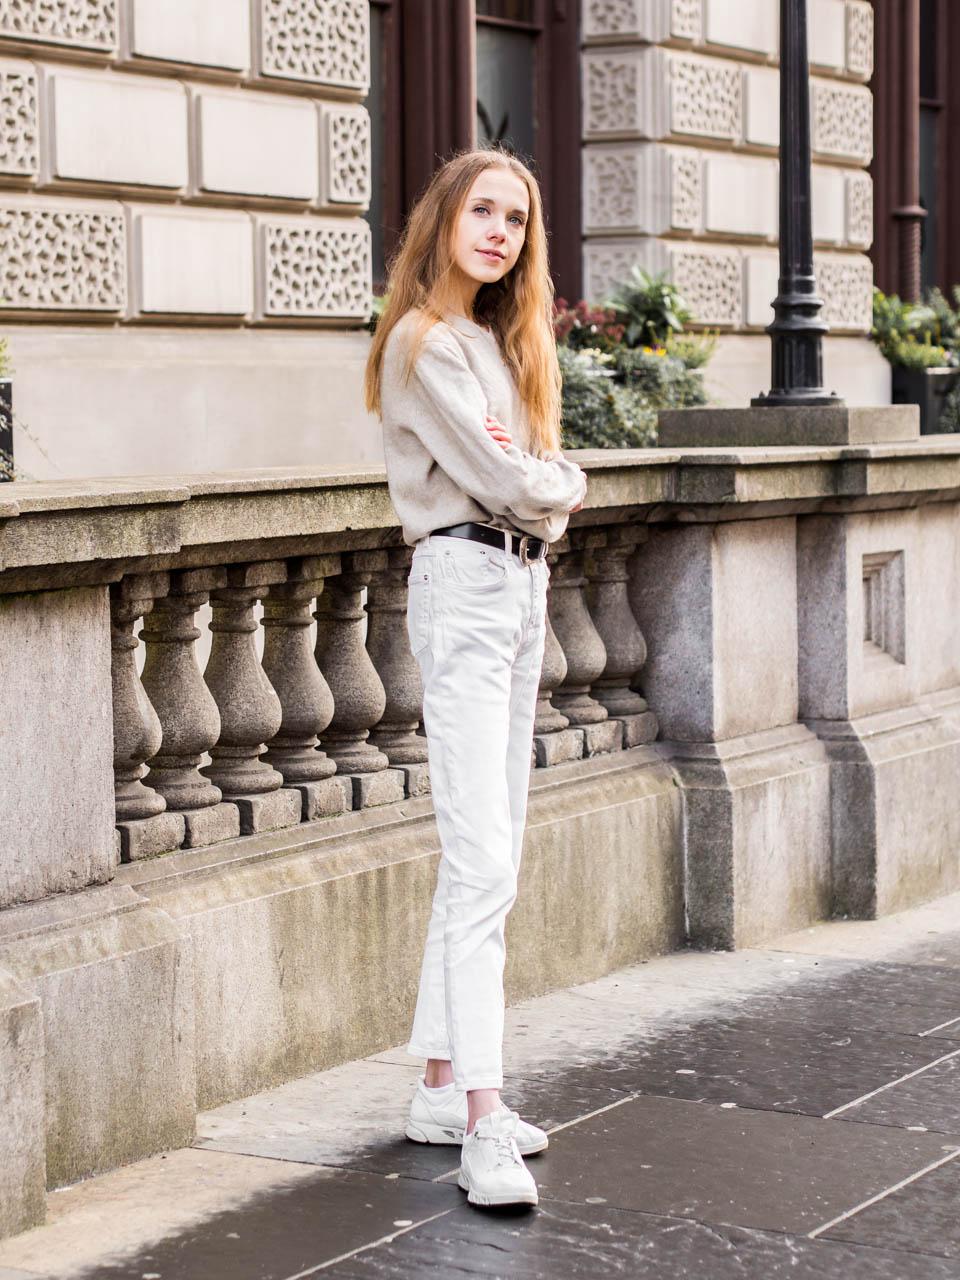 Neutral outfit with jeans and jumper // Farkut ja neule, neutraalit värit, syysmuoti